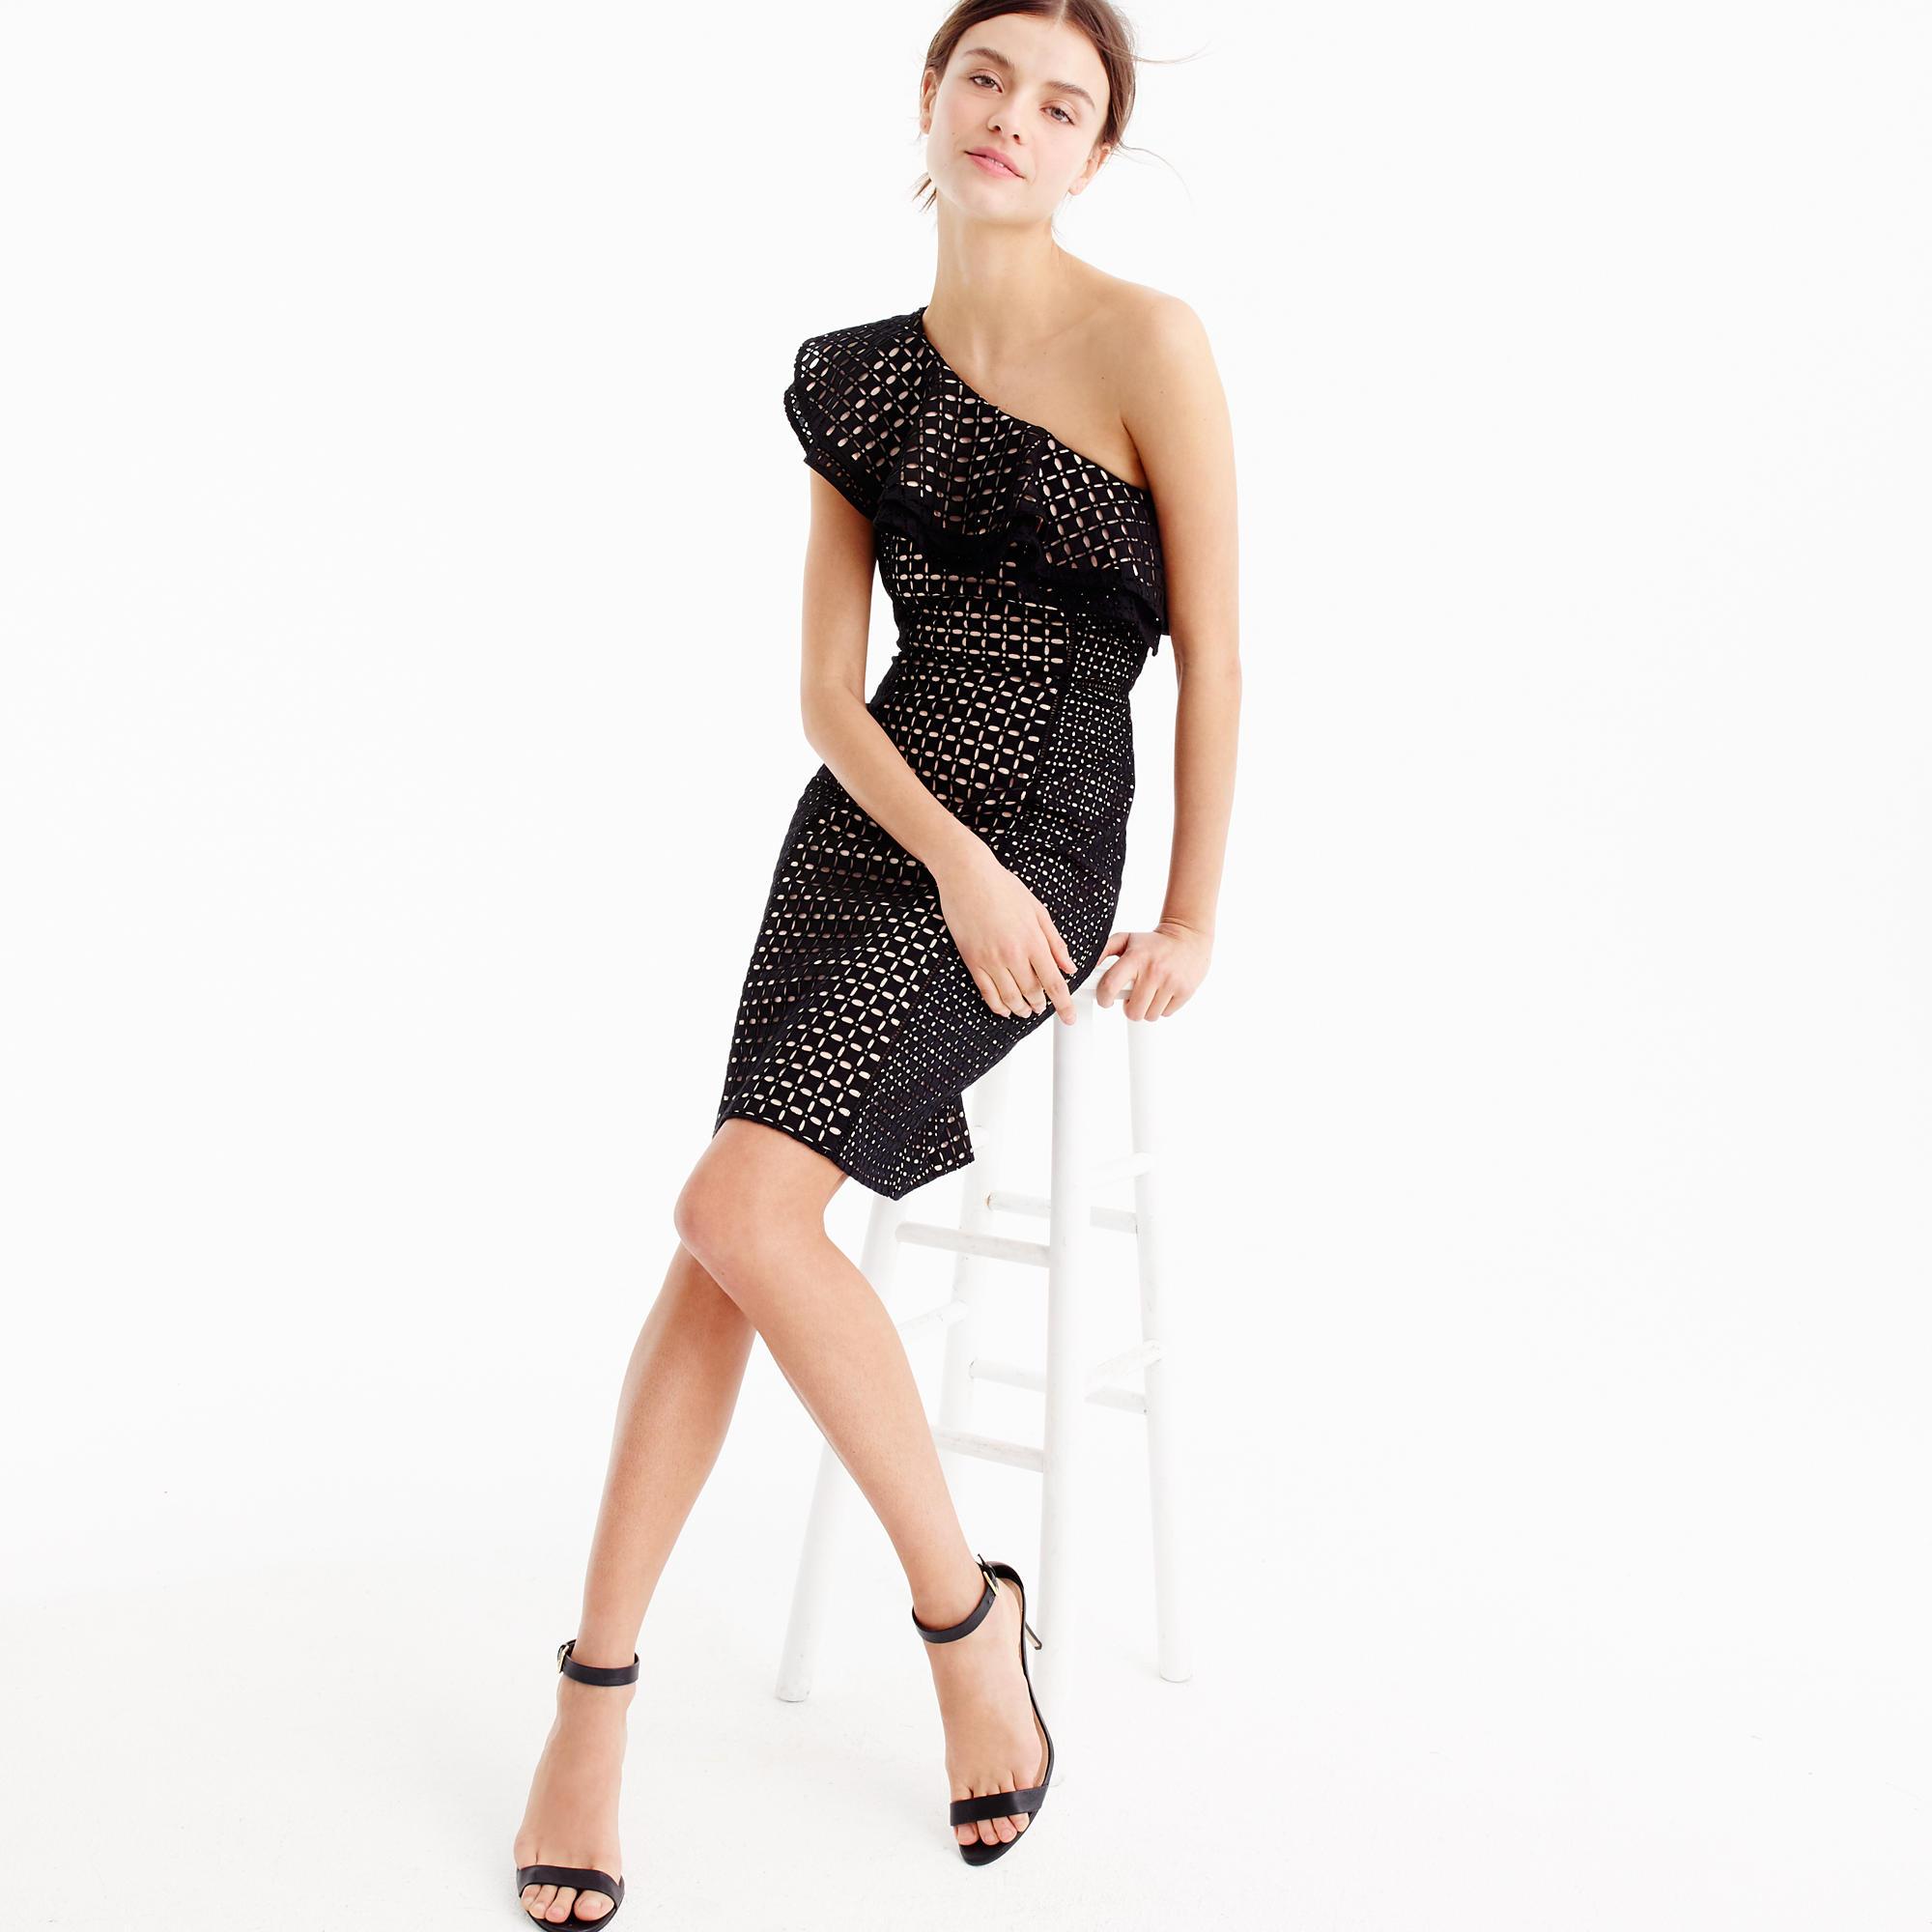 Black dress j crew -  Petite One Shoulder Dress In Eyelet